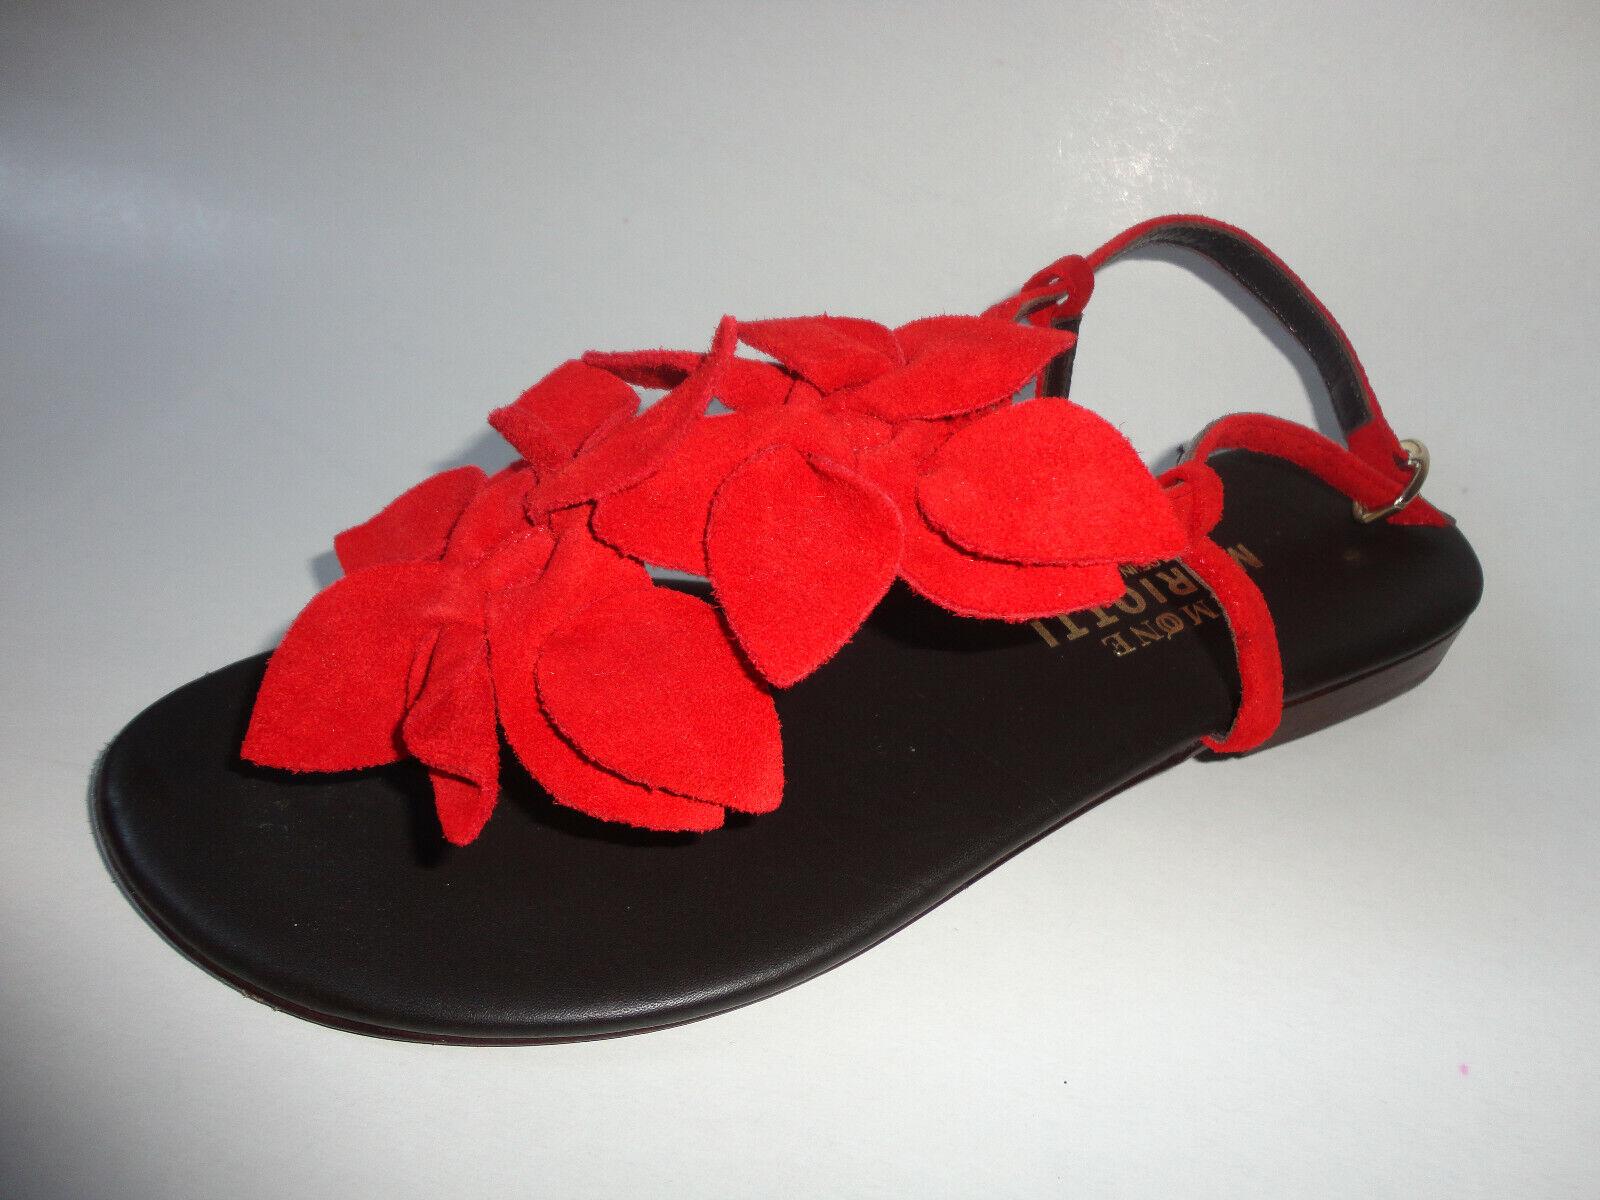 Leder Schuhe Sandalen Sandalette Gr.38 rot zu Kleid Rock Jacke Hose